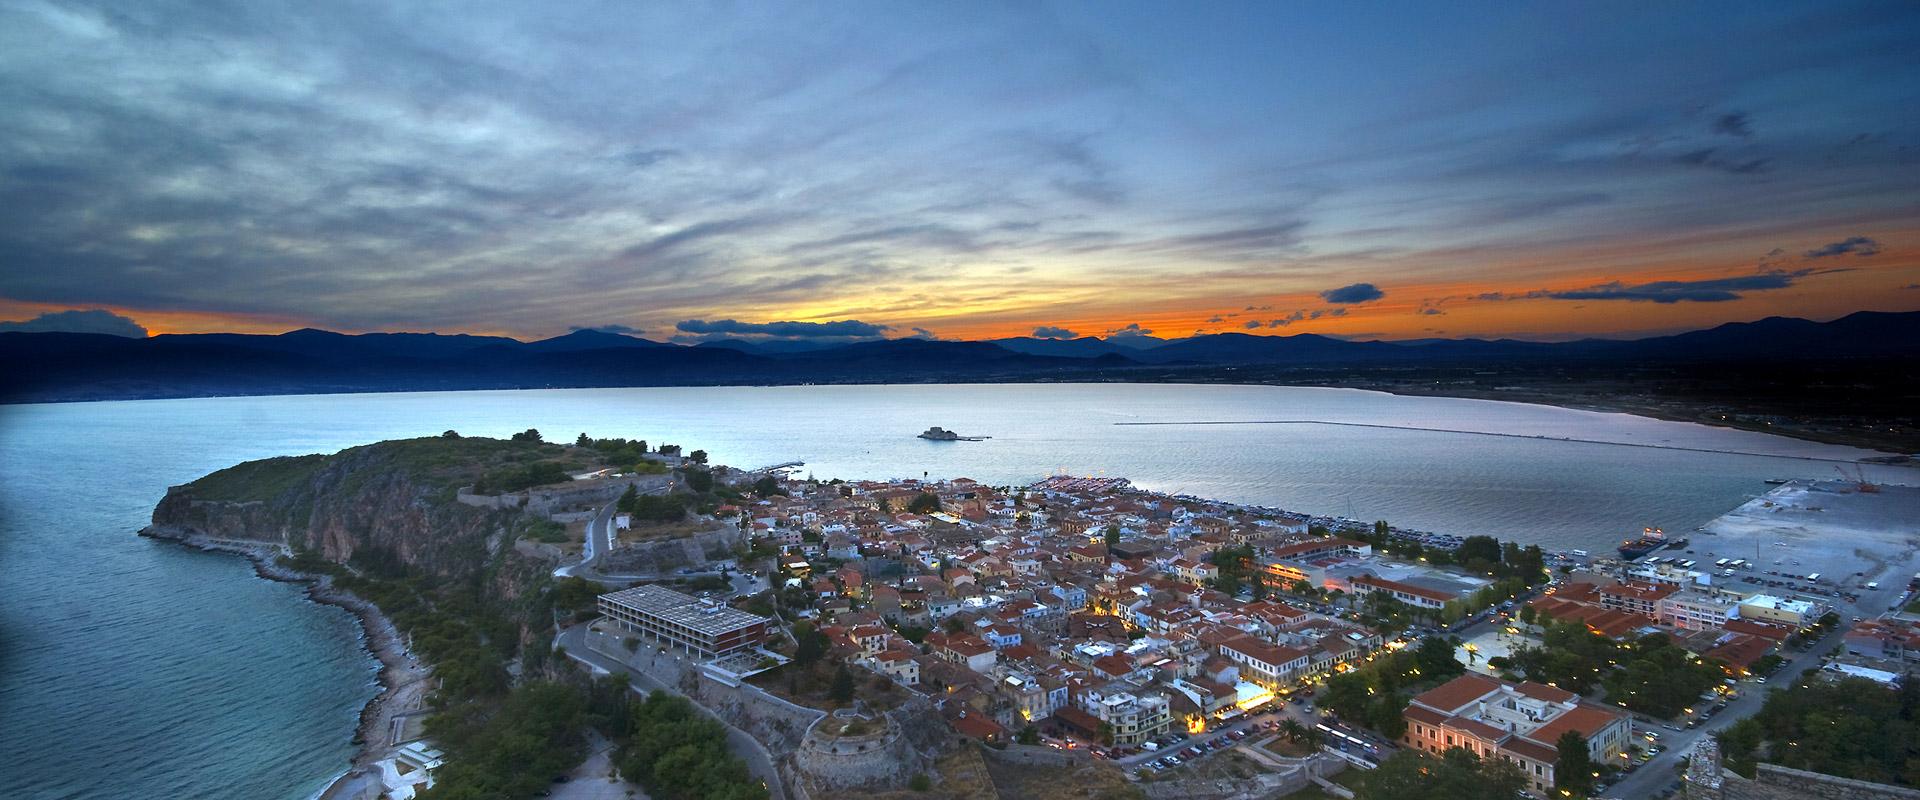 Nafplio town sunset - Private tours Athens Greece